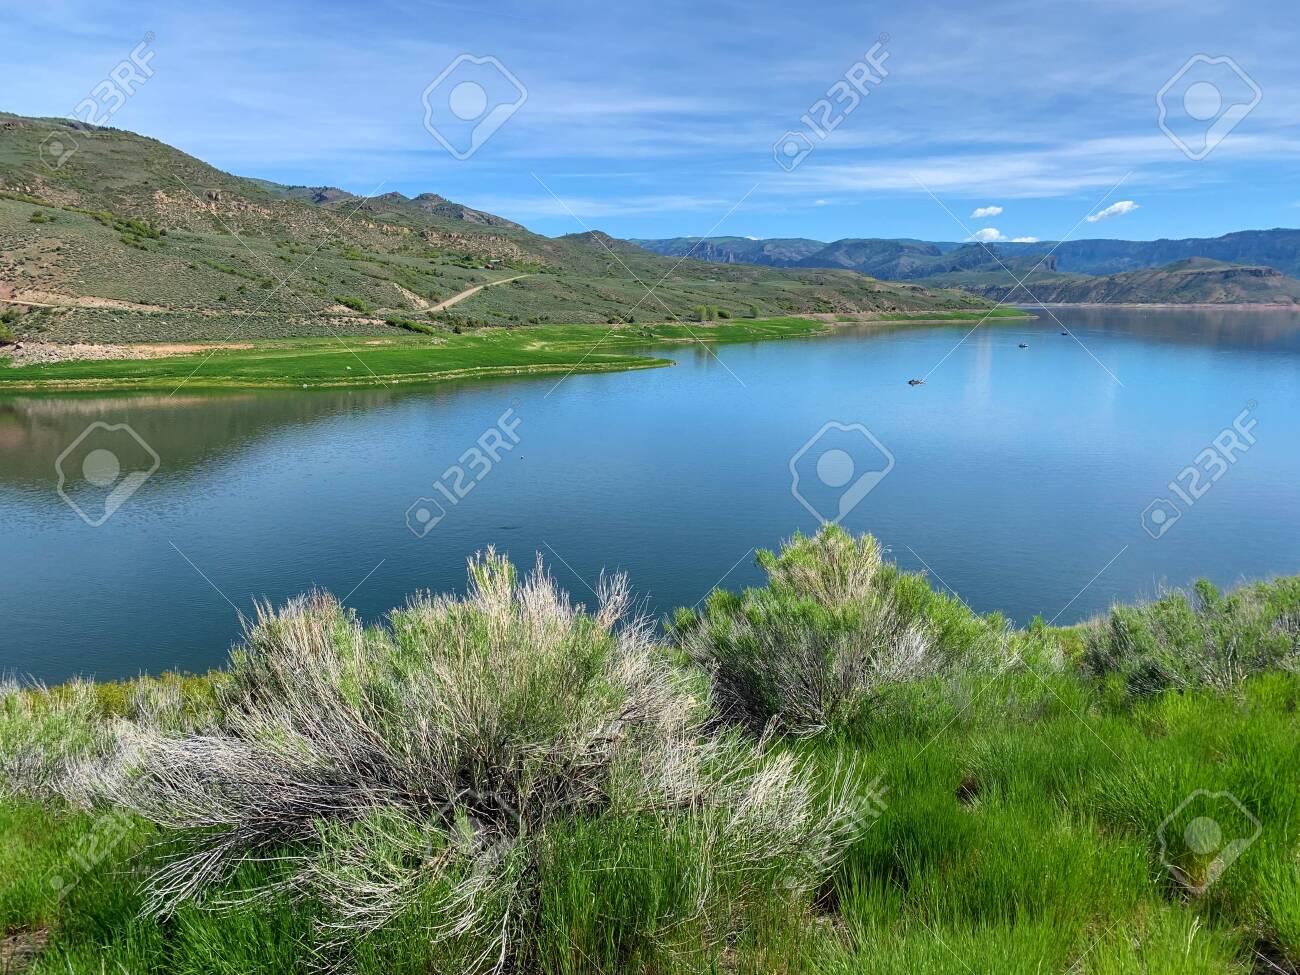 Blue Mesa Reservoir on the Gunnison River, Gunnison, Colorado - 125202192